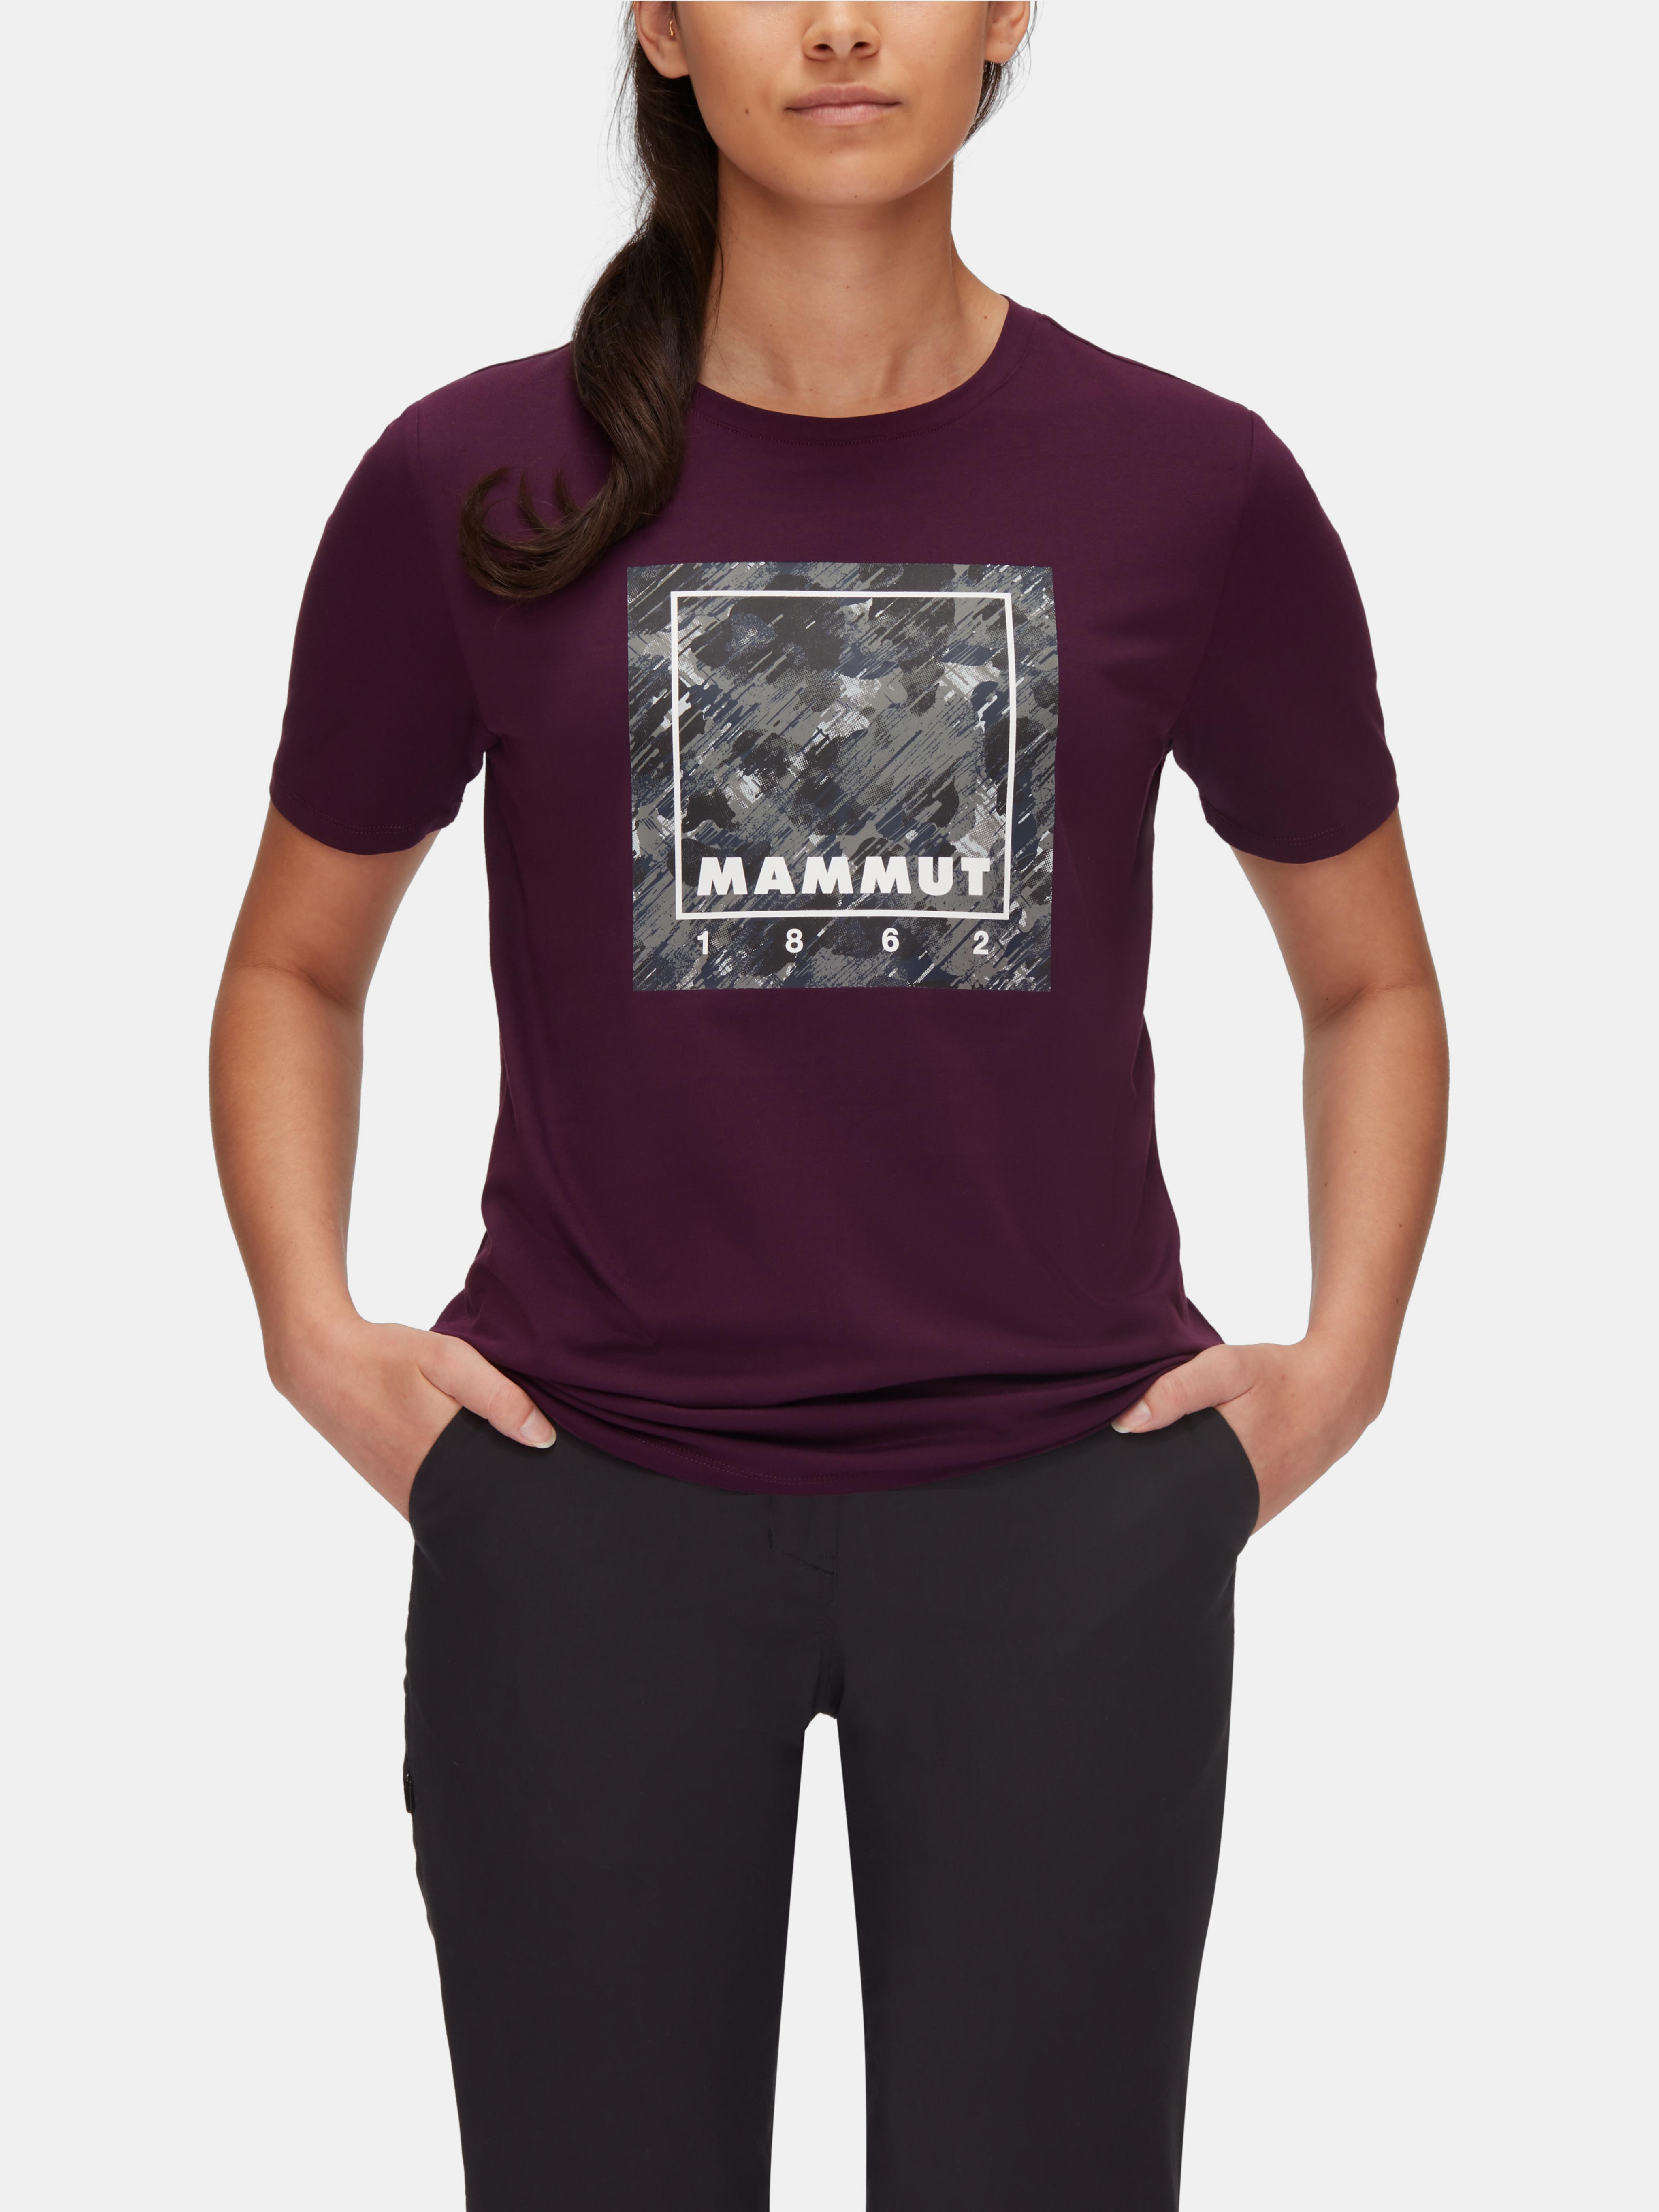 Mammut Graphic T-Shirt Women thumbnail